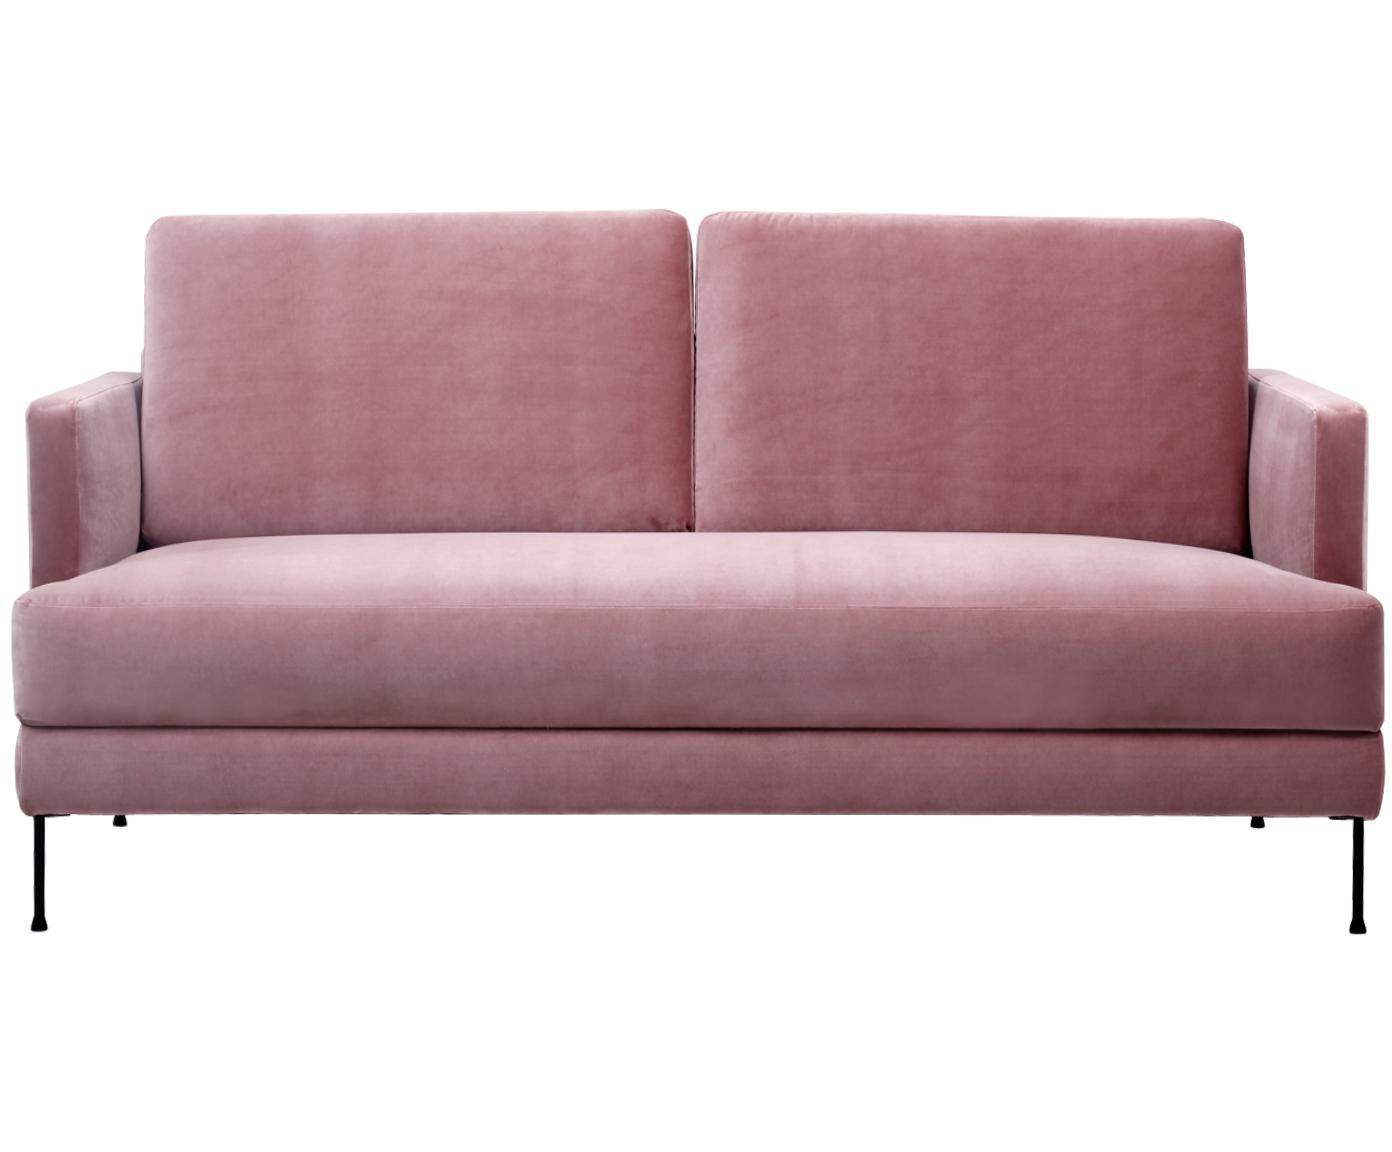 Fluwelen bank Fluente (2-zits), Bekleding: fluweel (hoogwaardig poly, Frame: massief grenenhout, Poten: gelakt metaal, Roze, B 168 x D 83 cm